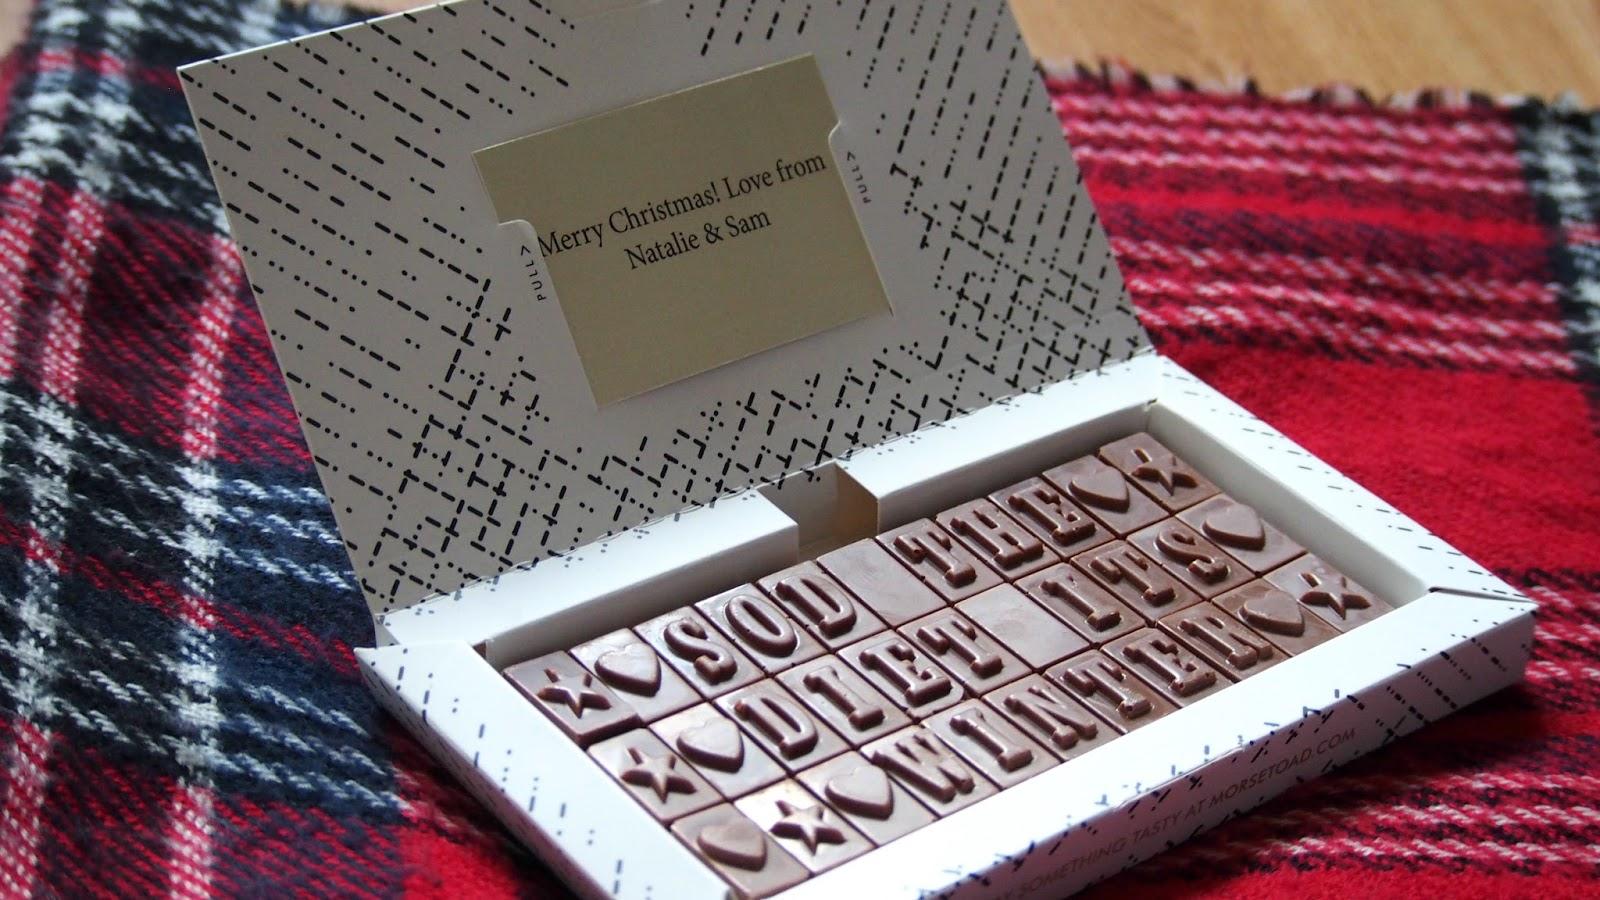 Display of chocolate